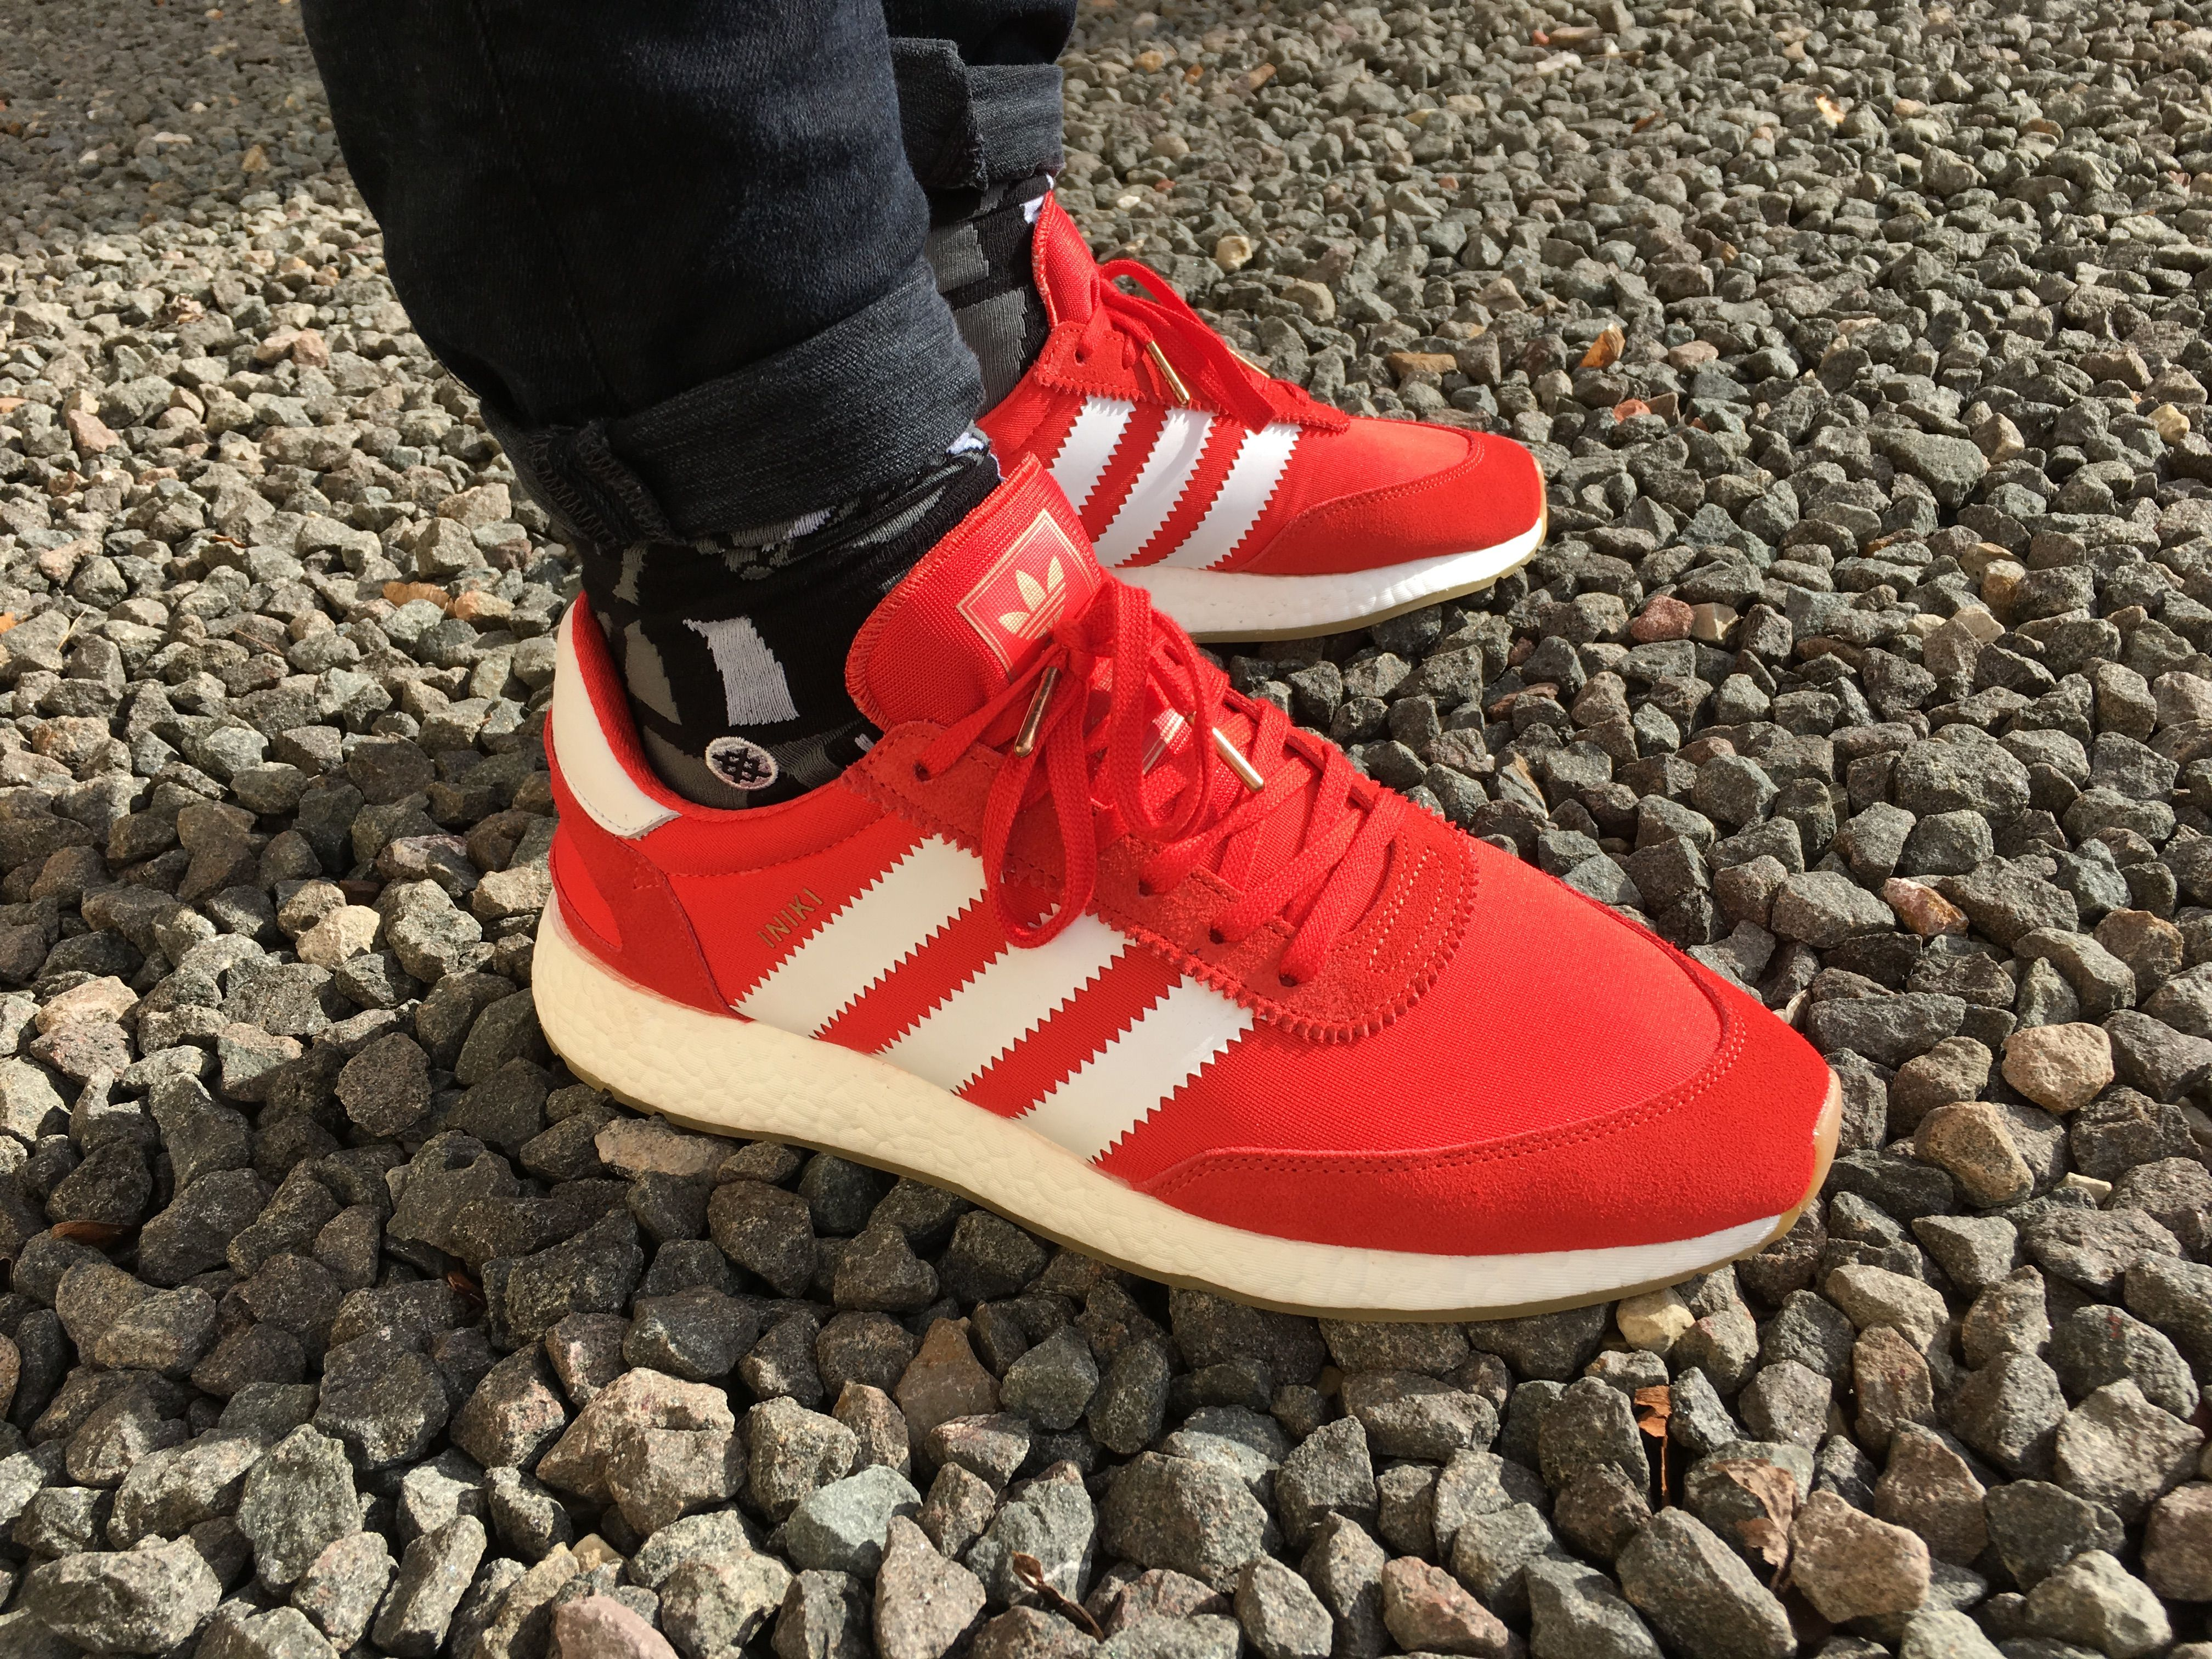 Review Adidas Iniki Runner Boost Size 40 Custom Zx Flux